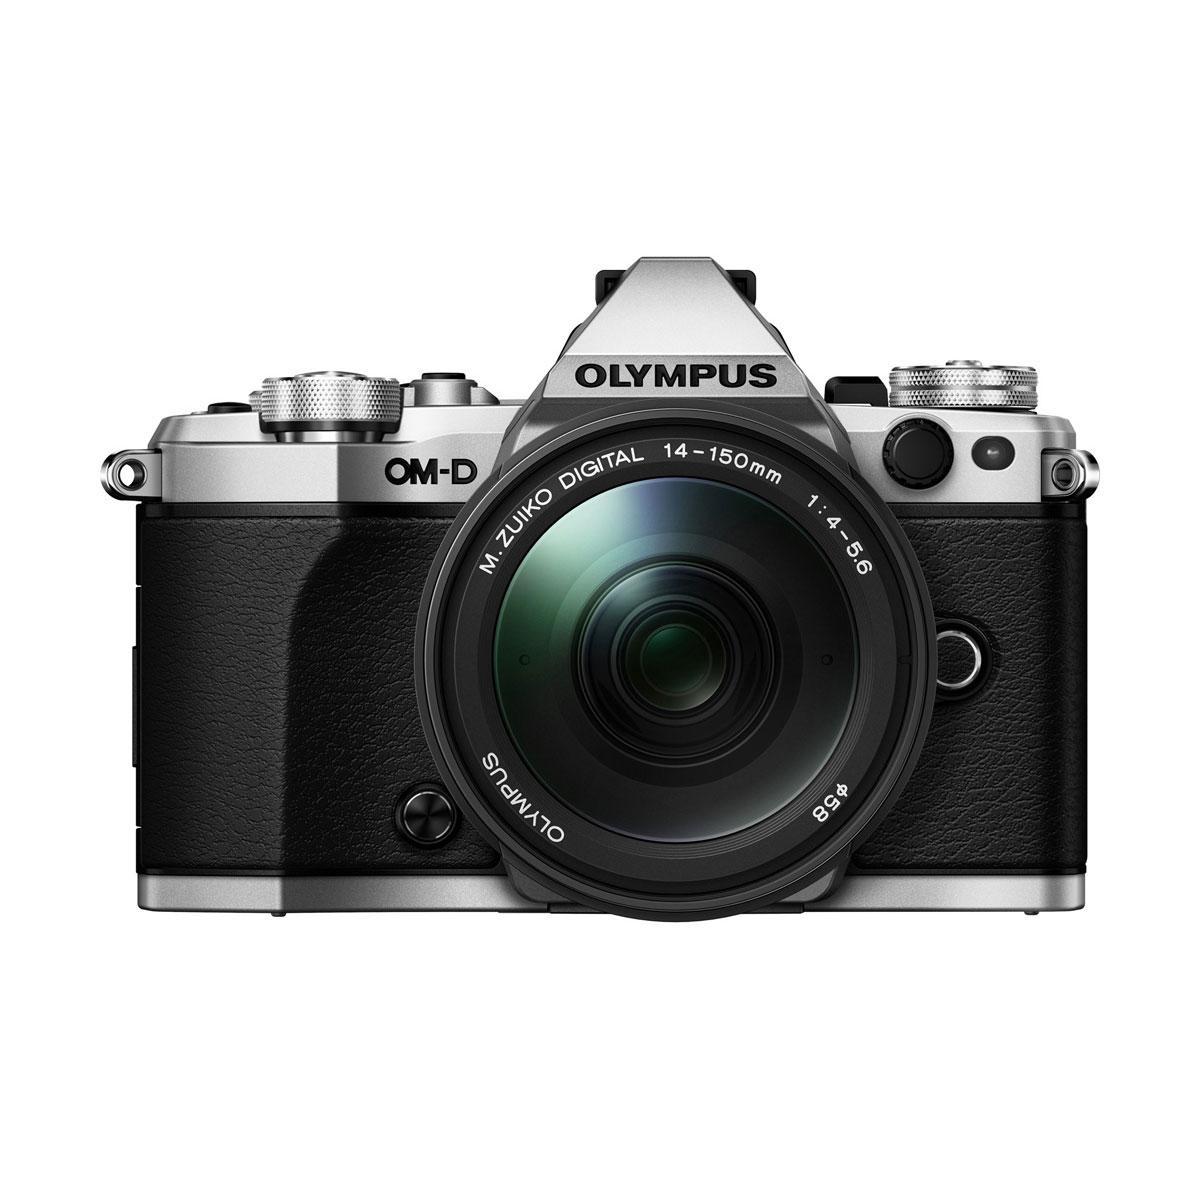 Olympus OM-D E-M5 MK II + M.Zuiko 14-150mm II – Hopea